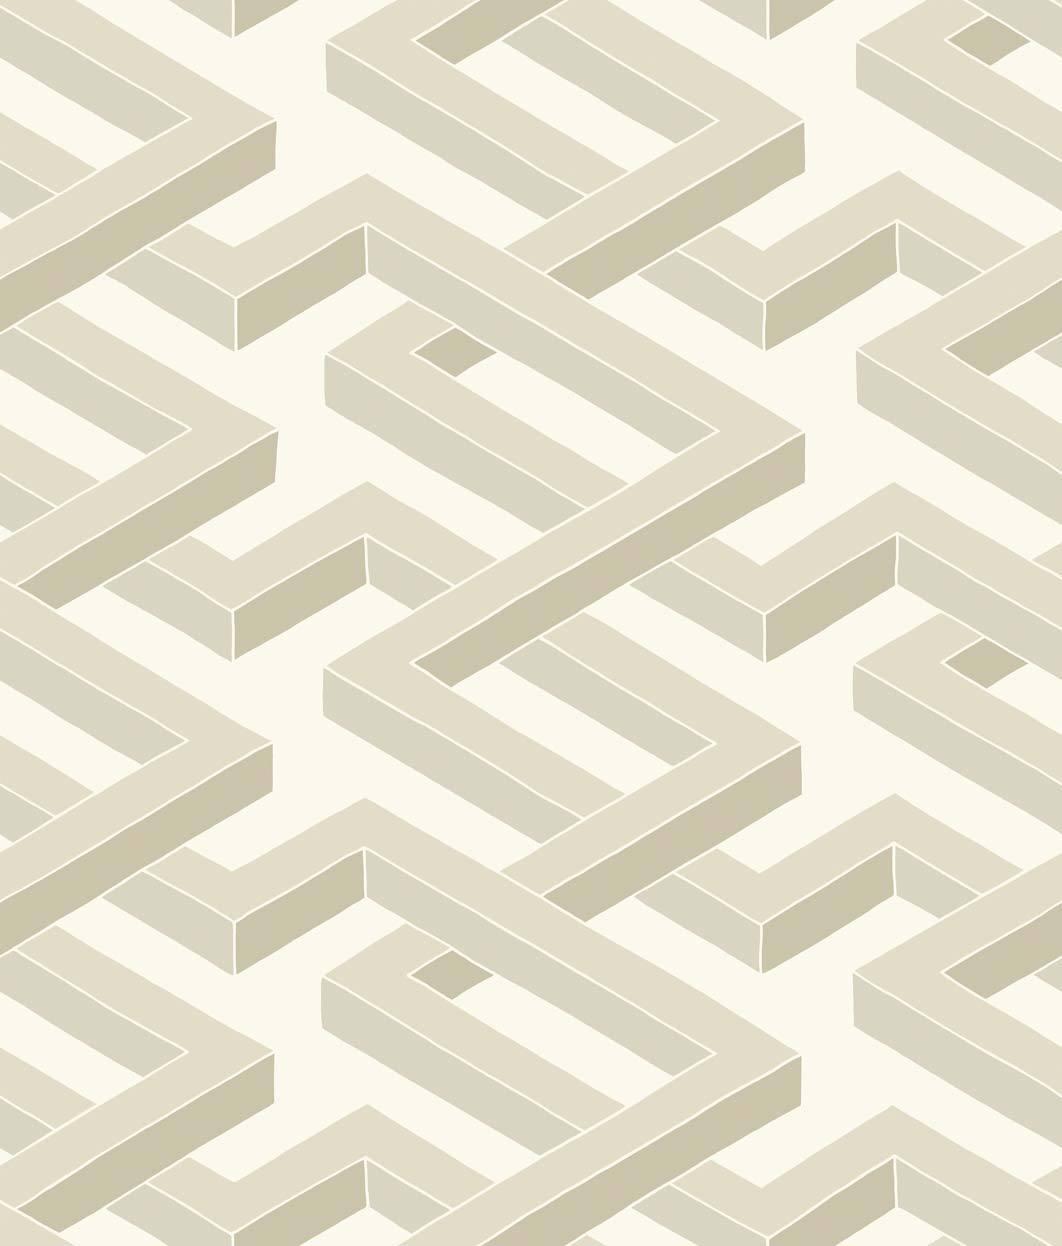 Обои Cole & Son Geometric II 105/1003, интернет магазин Волео